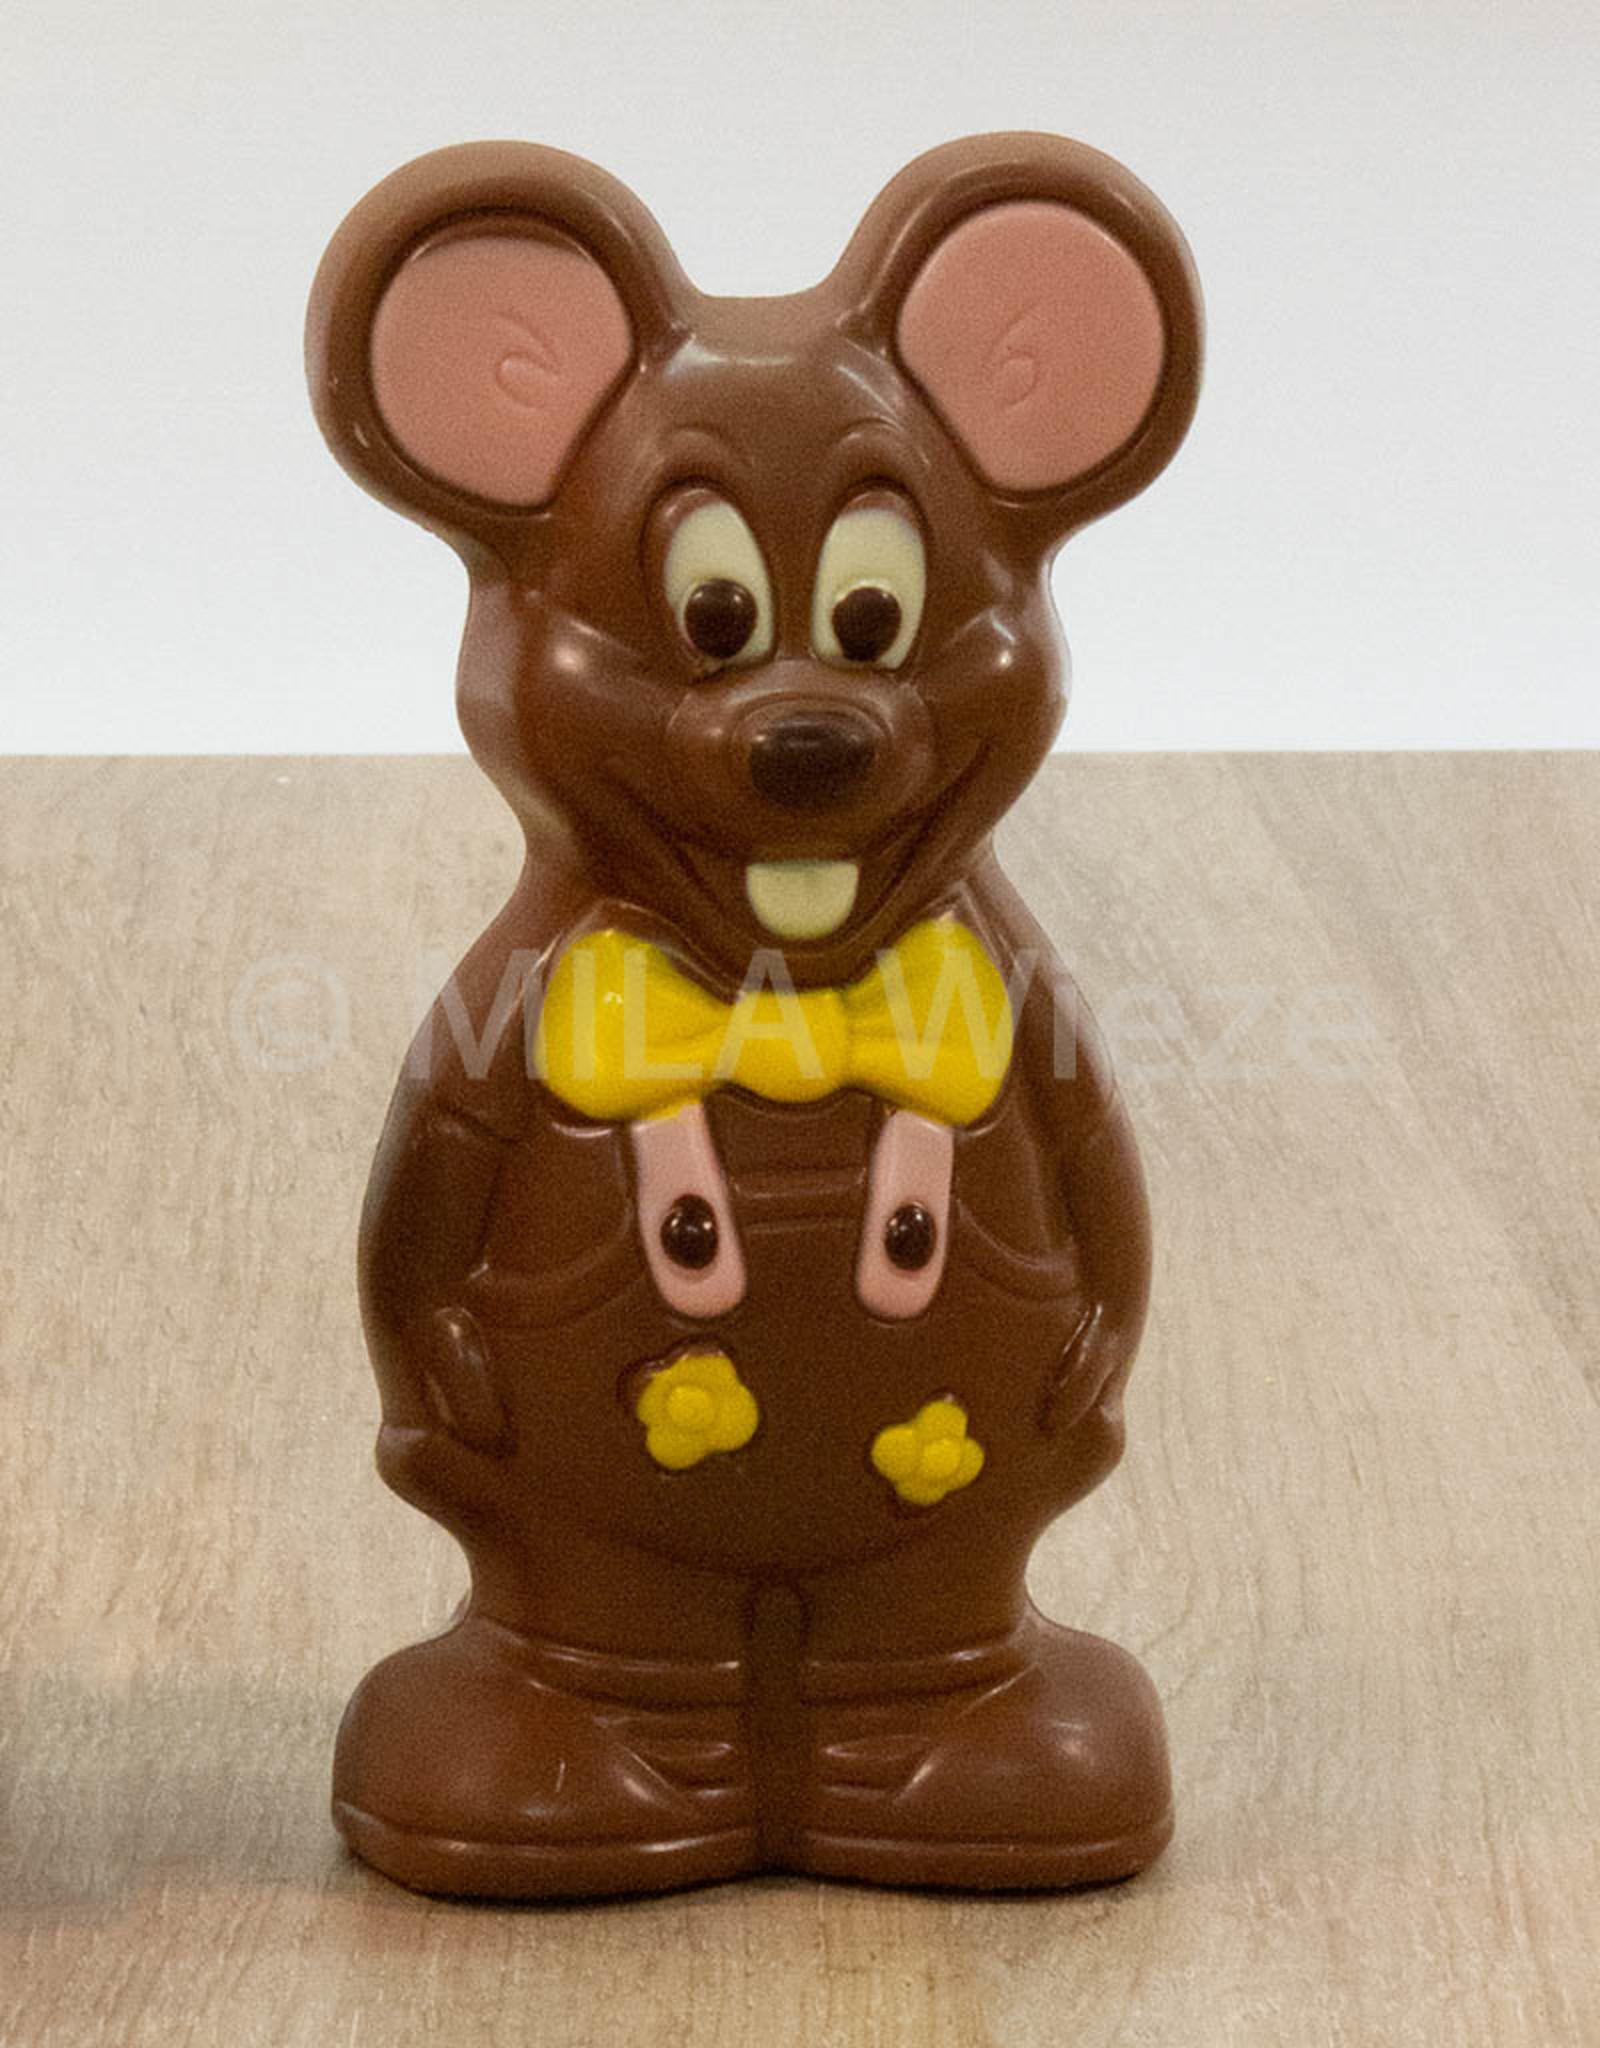 Jack of Lizzy de muis deco - 140 gr - 16 cm - Callebaut chocolade